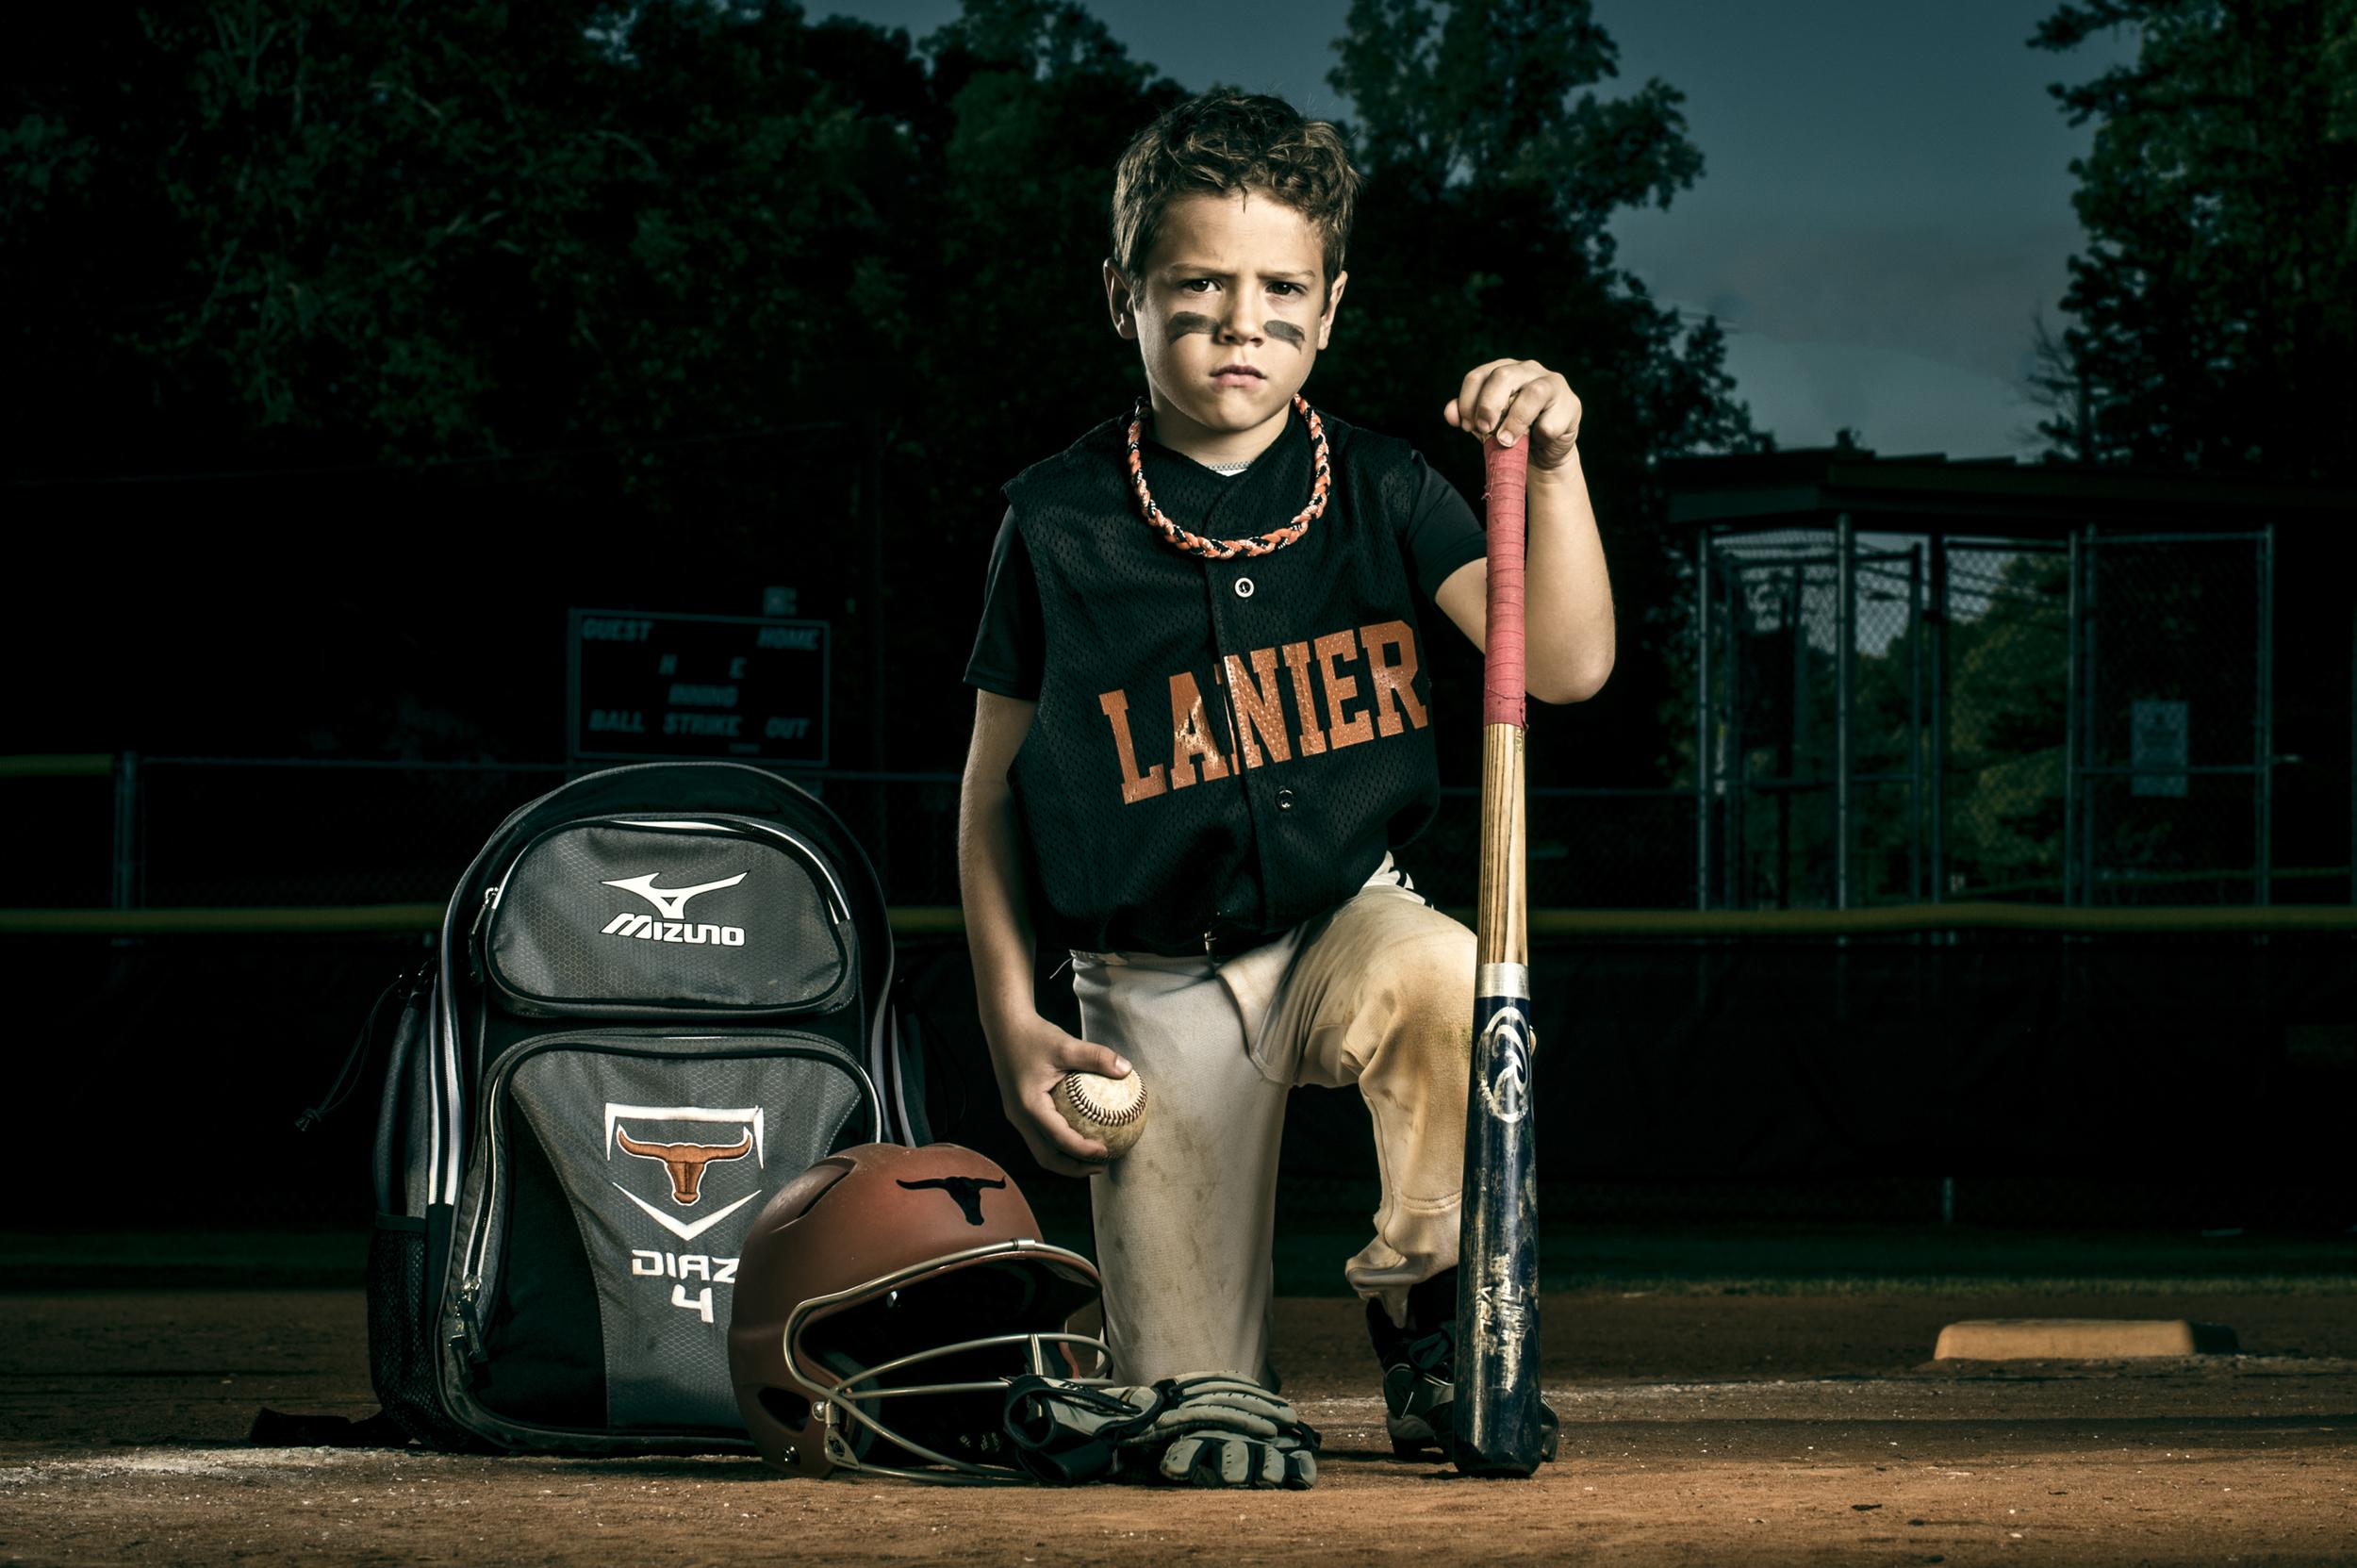 Lanier Baseball